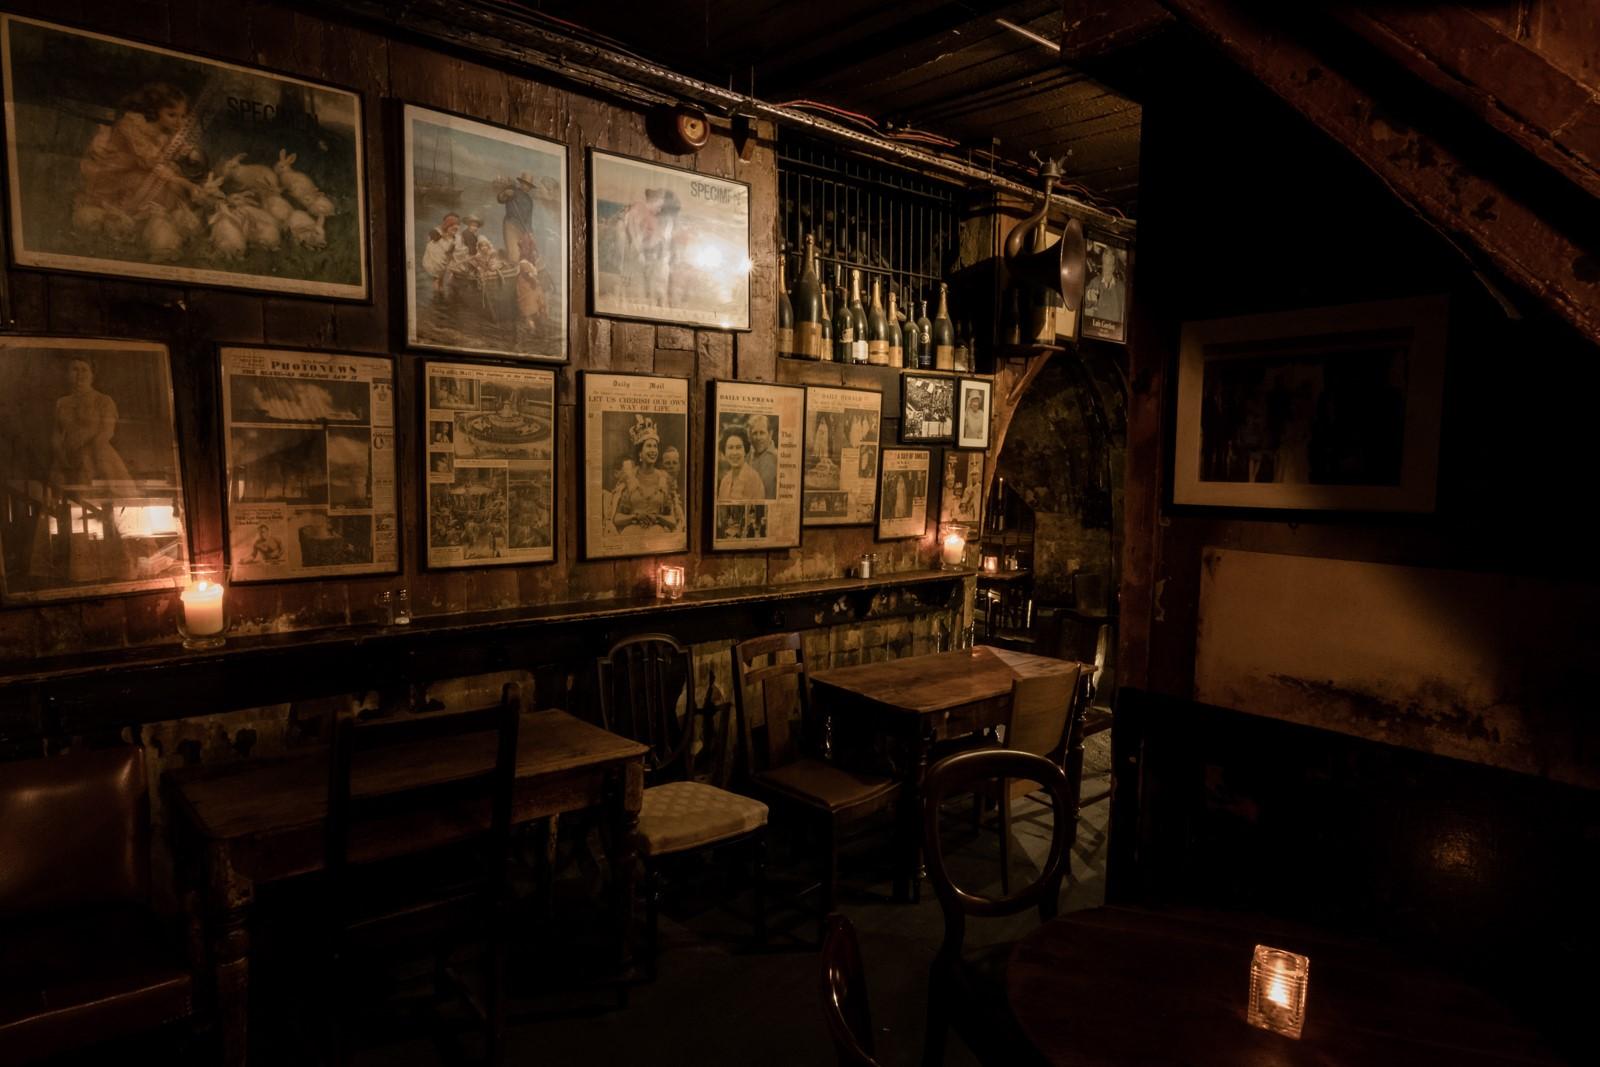 Gordon's Wine Bar is the oldest in London